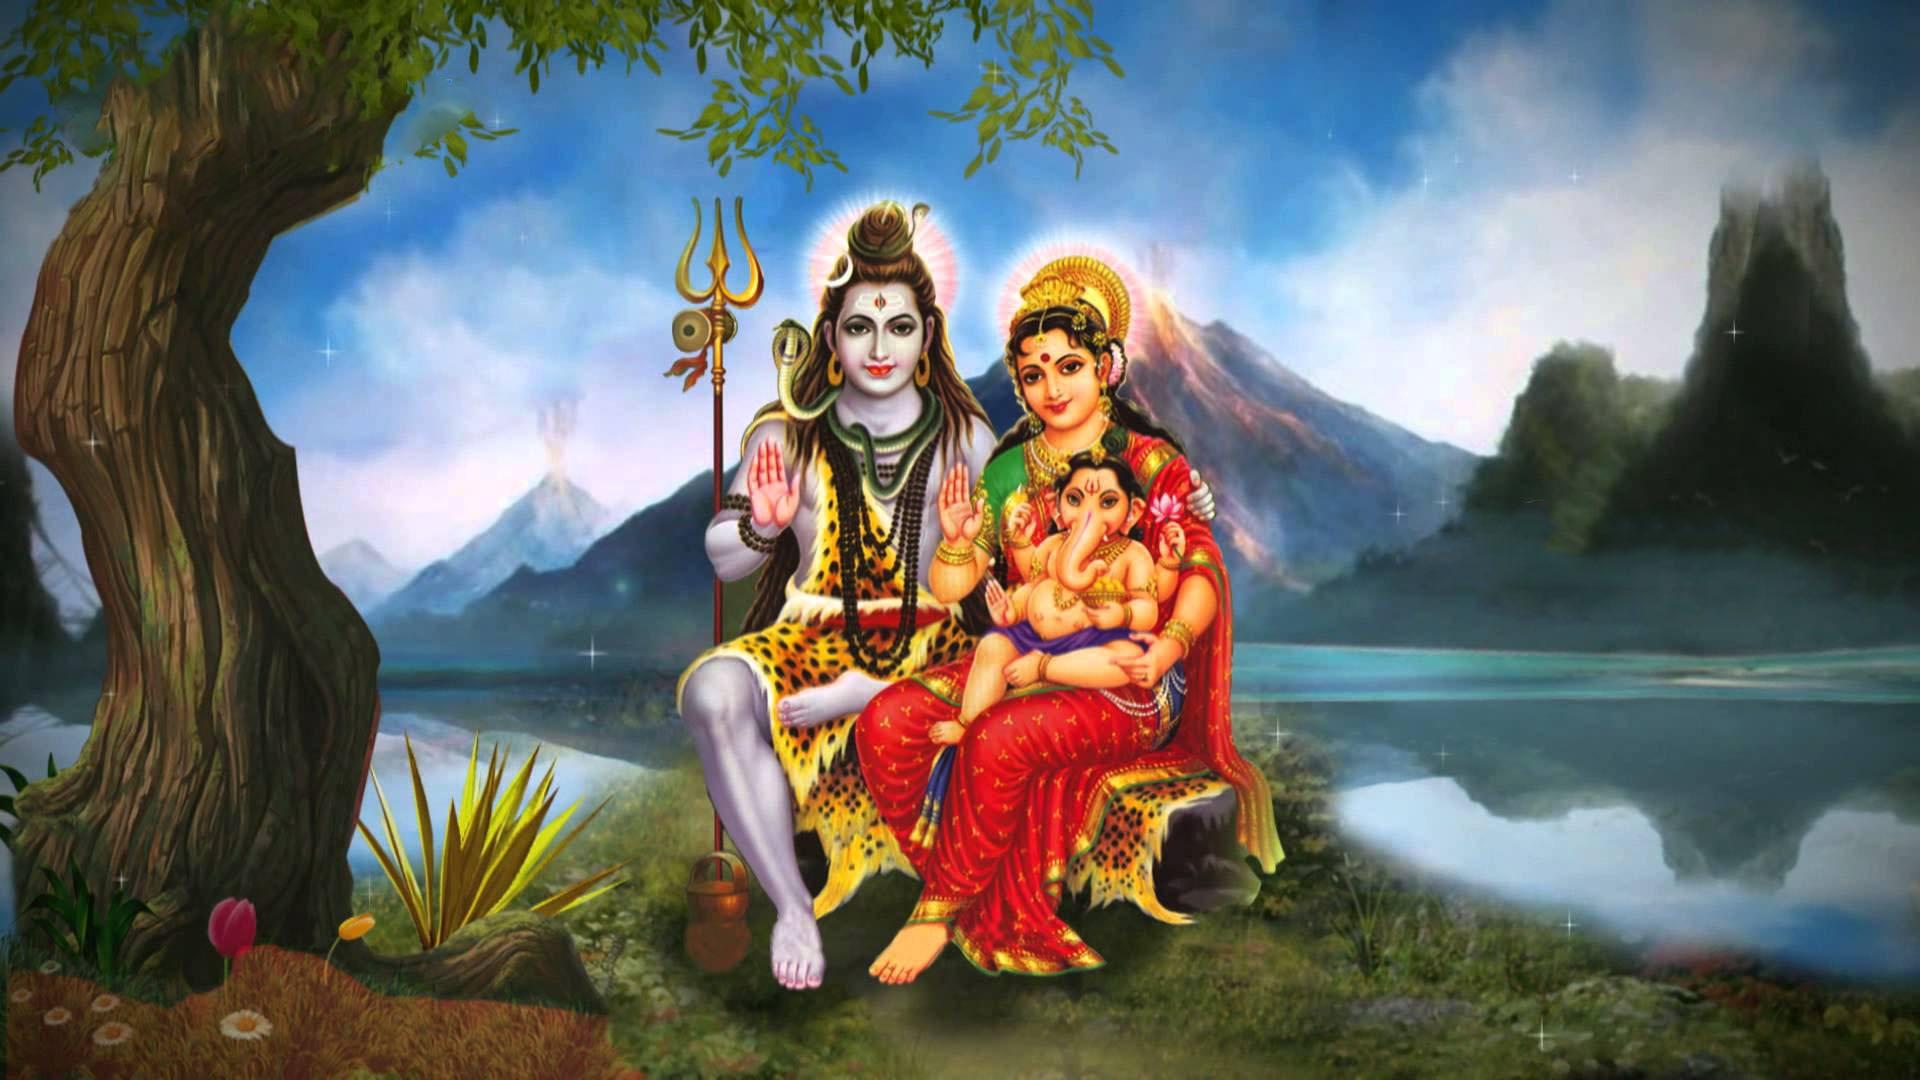 Shiv Parivar Image Full Size